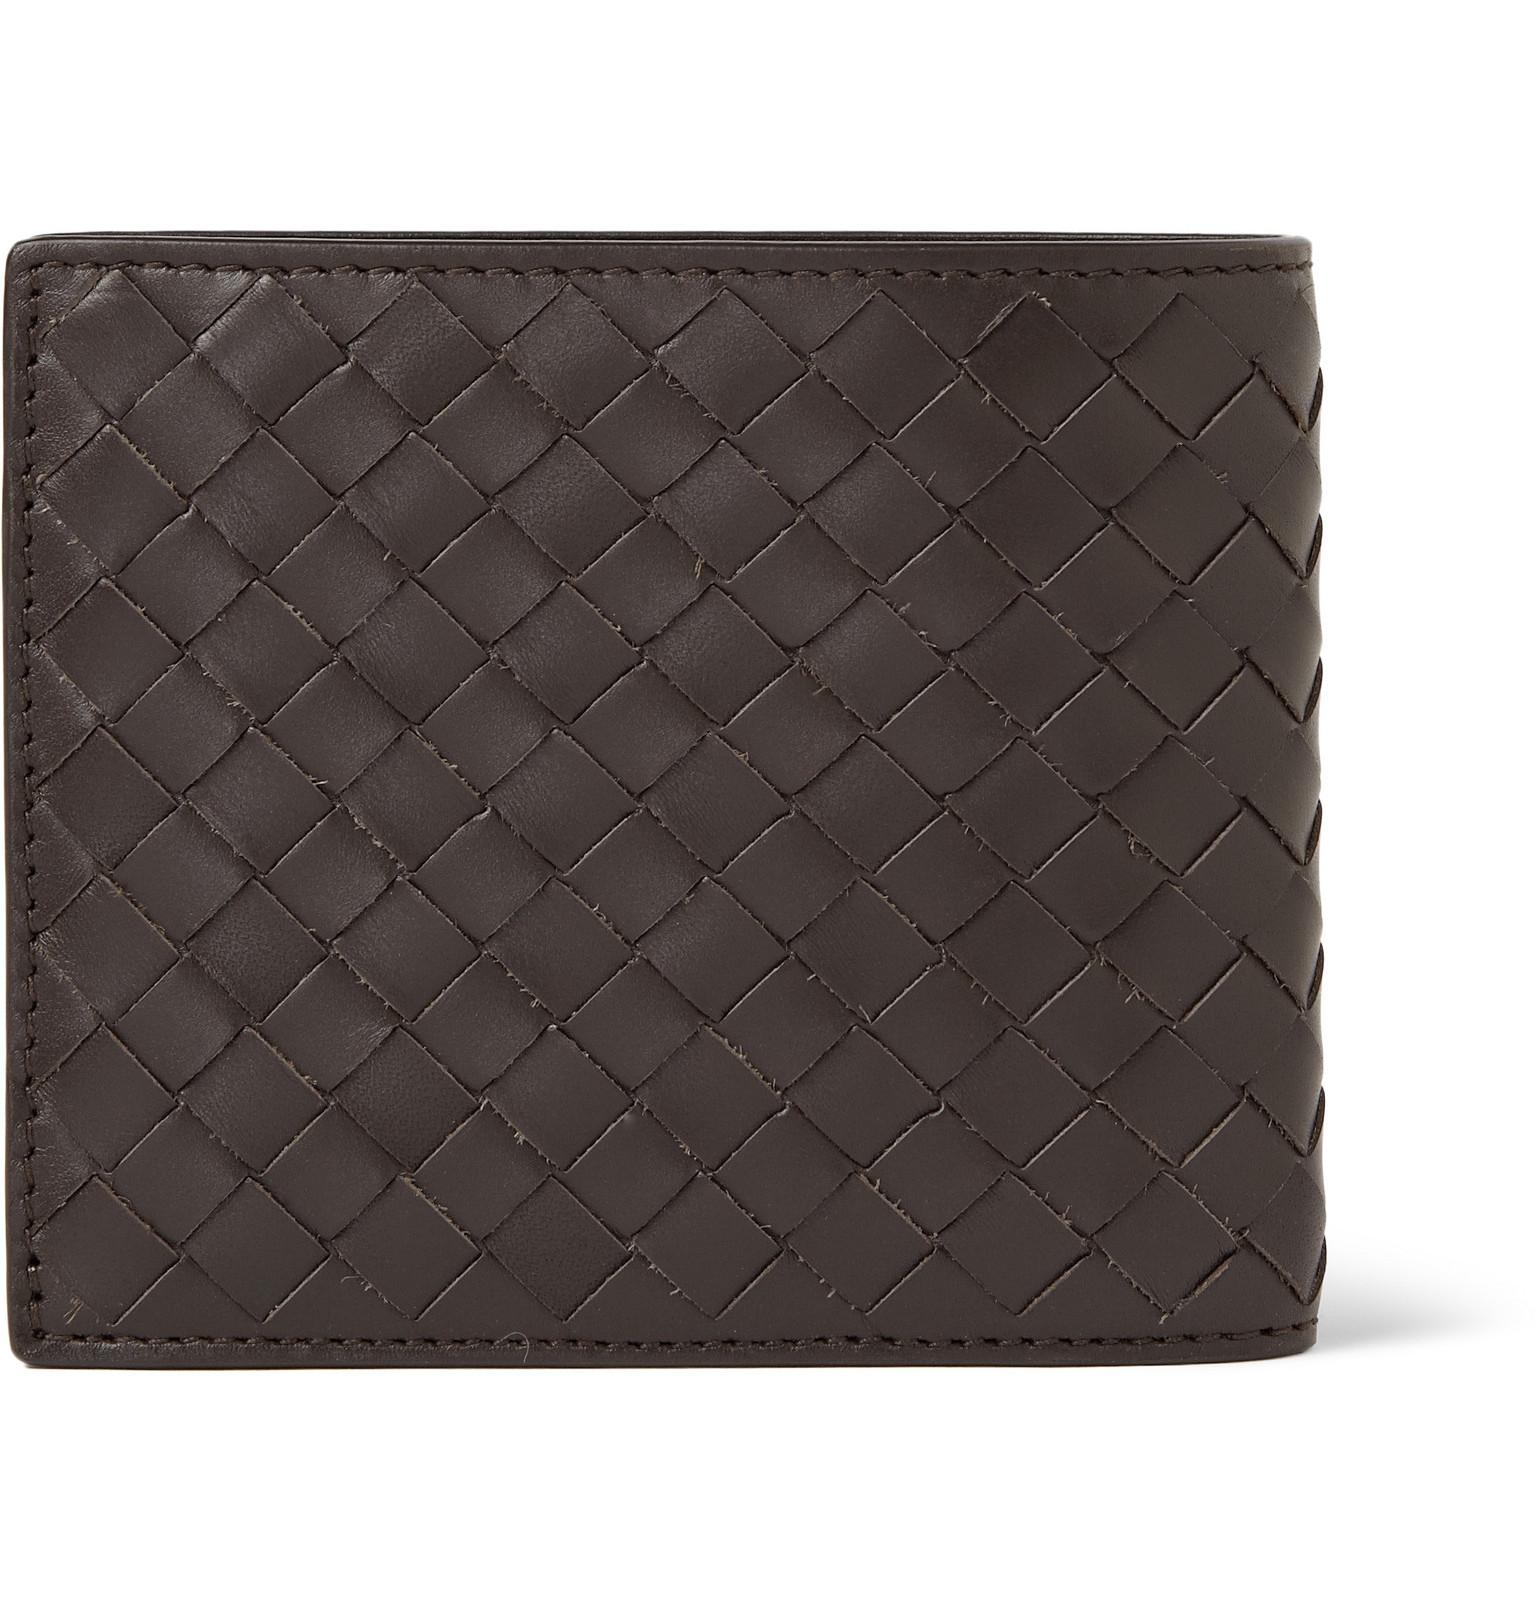 Bottega Veneta - Intrecciato Leather Billfold Wallet c45e8f64f769b